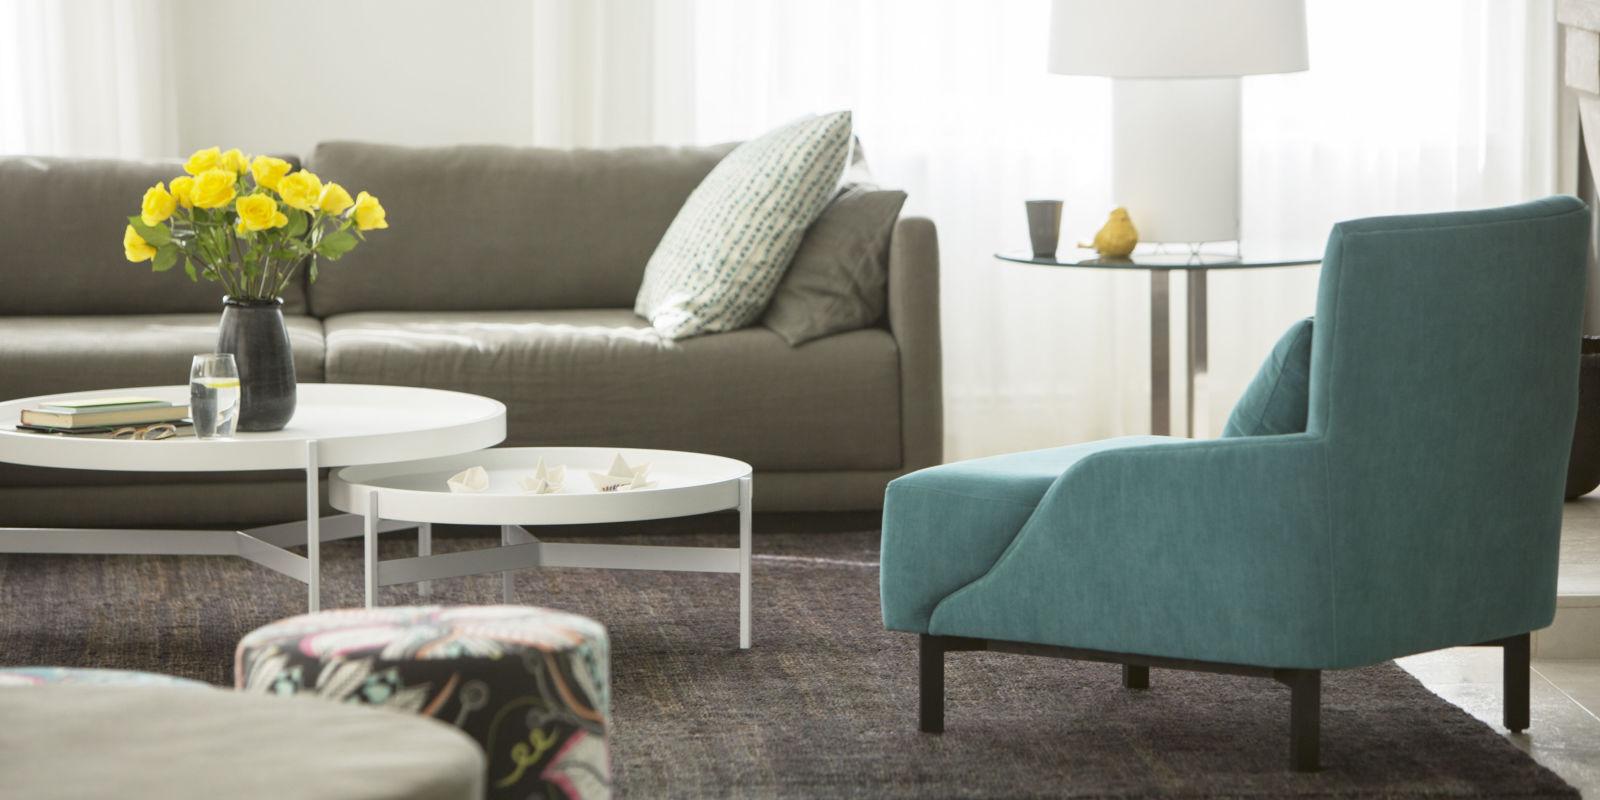 40 secrets of modern living room hawk haven - Secret keys contemporary living room design ...